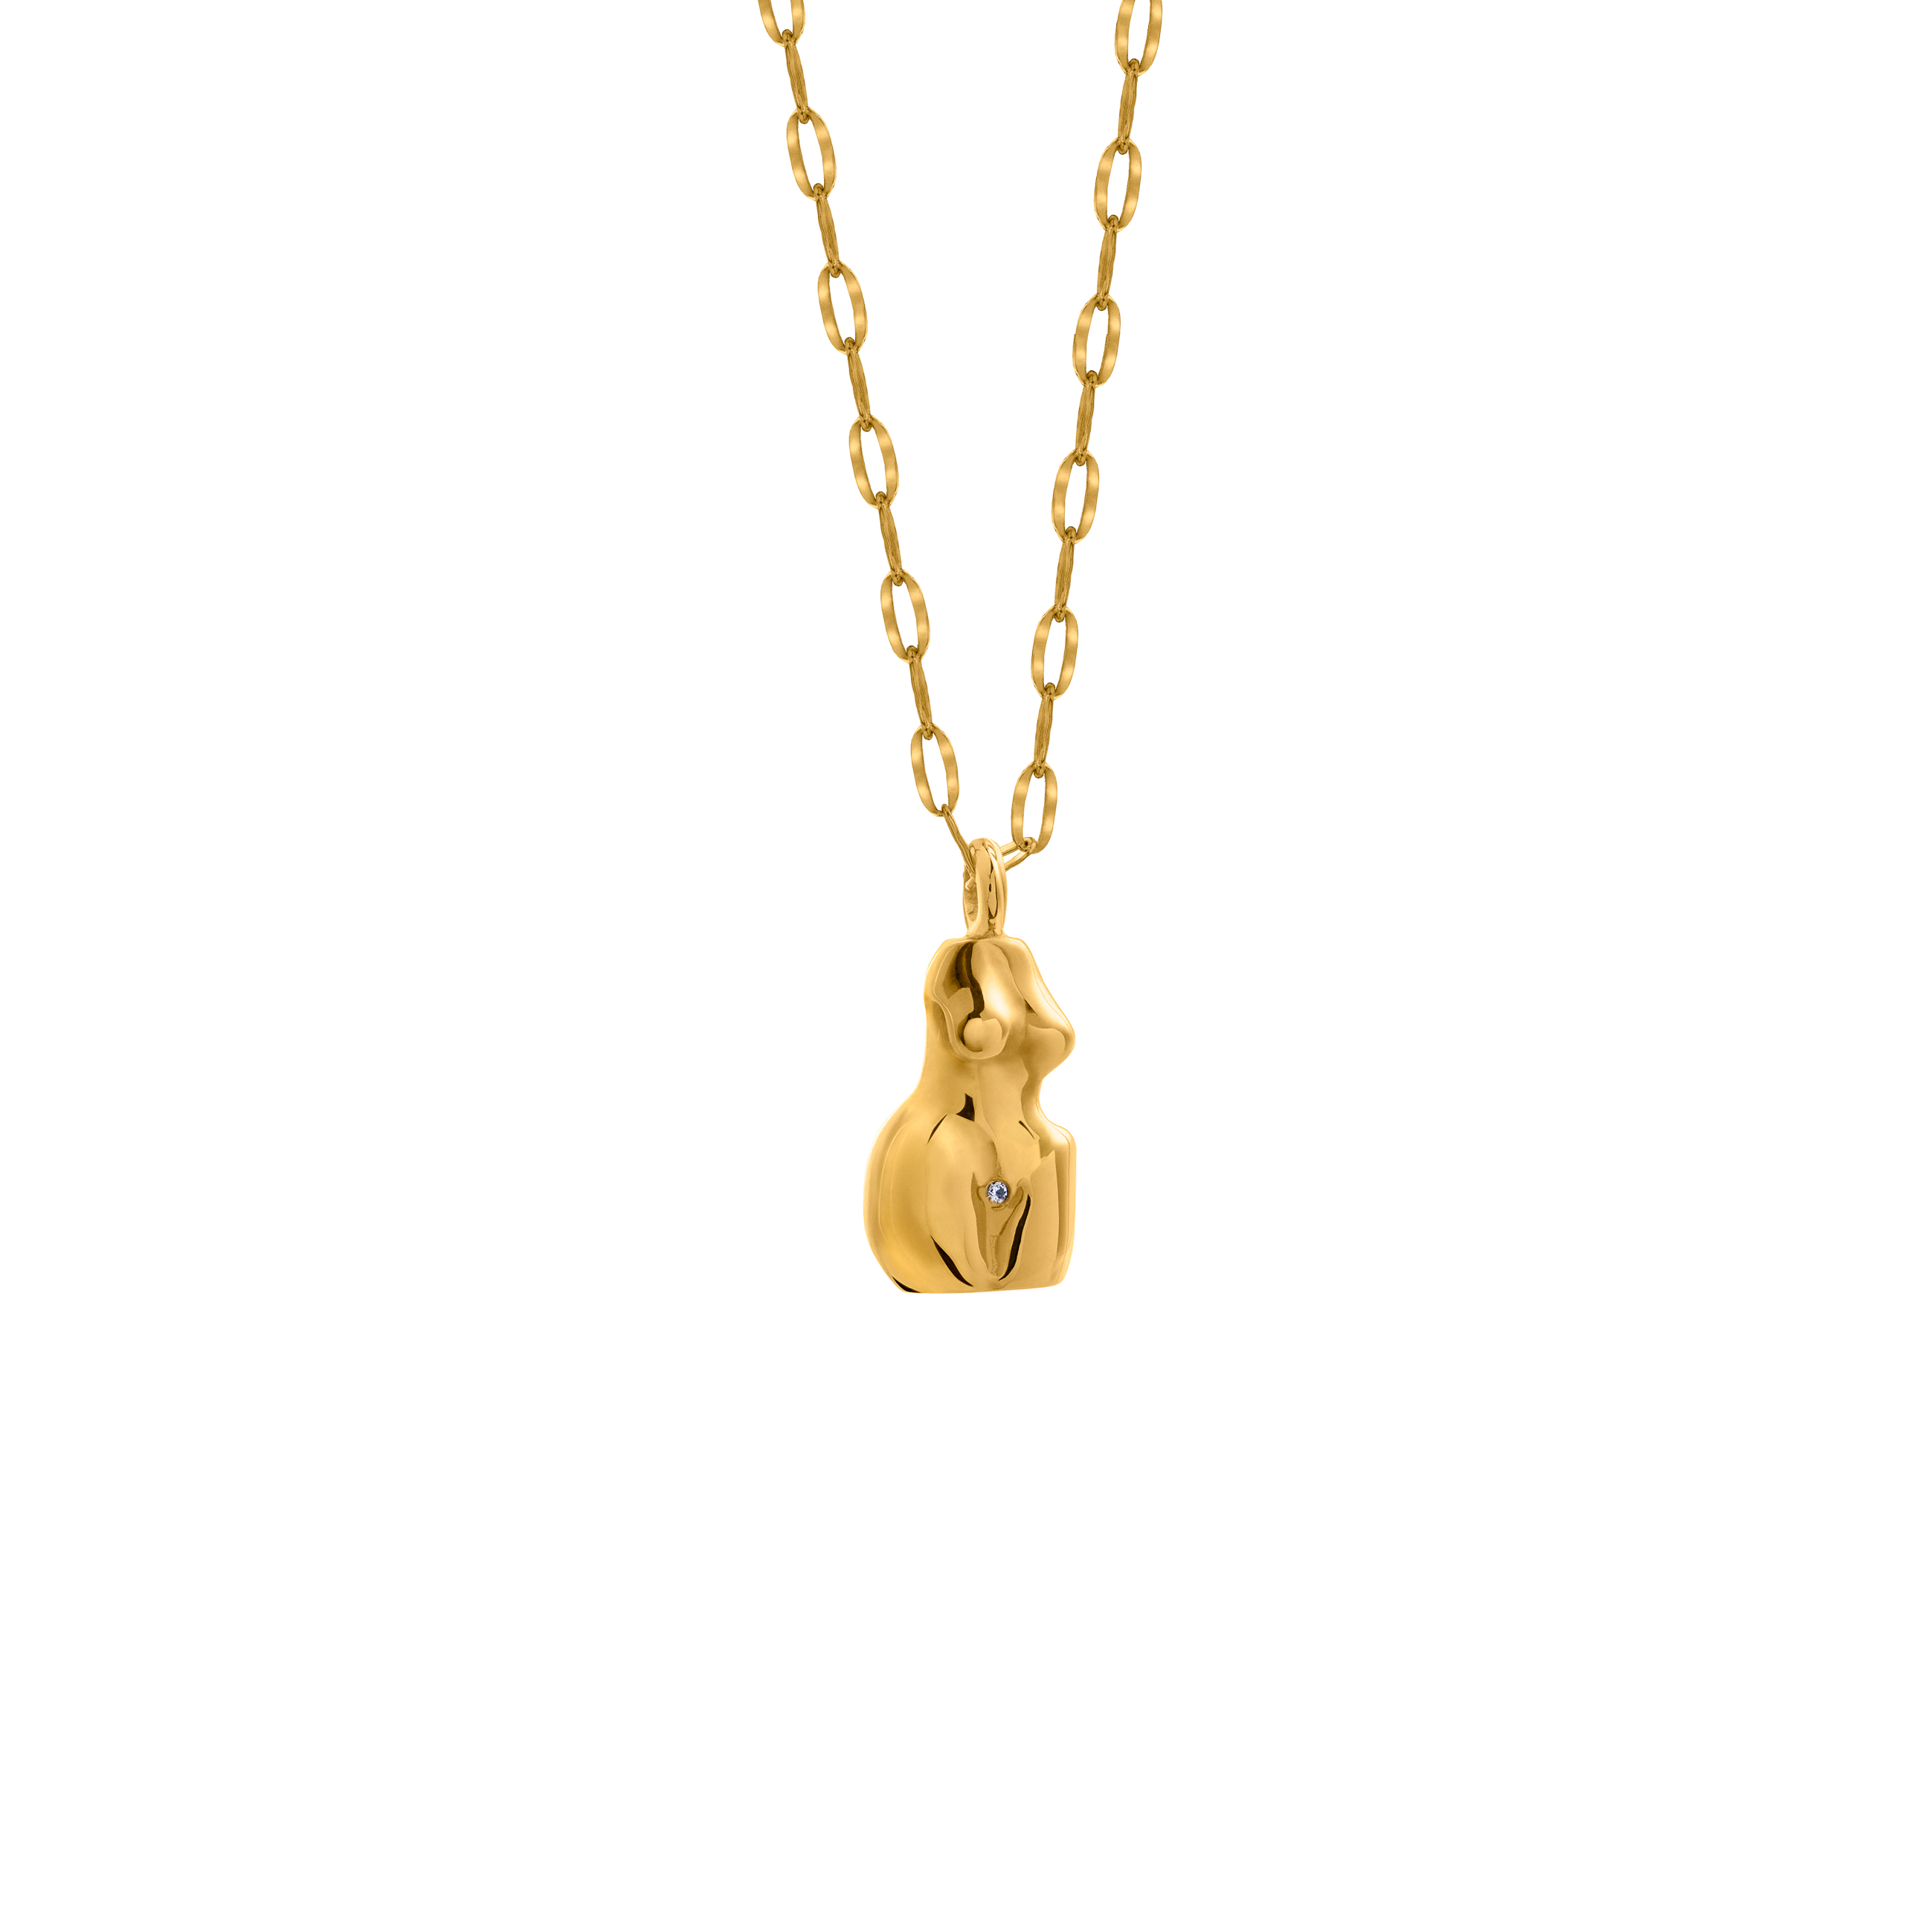 woman necklace 3D / gold zirconia